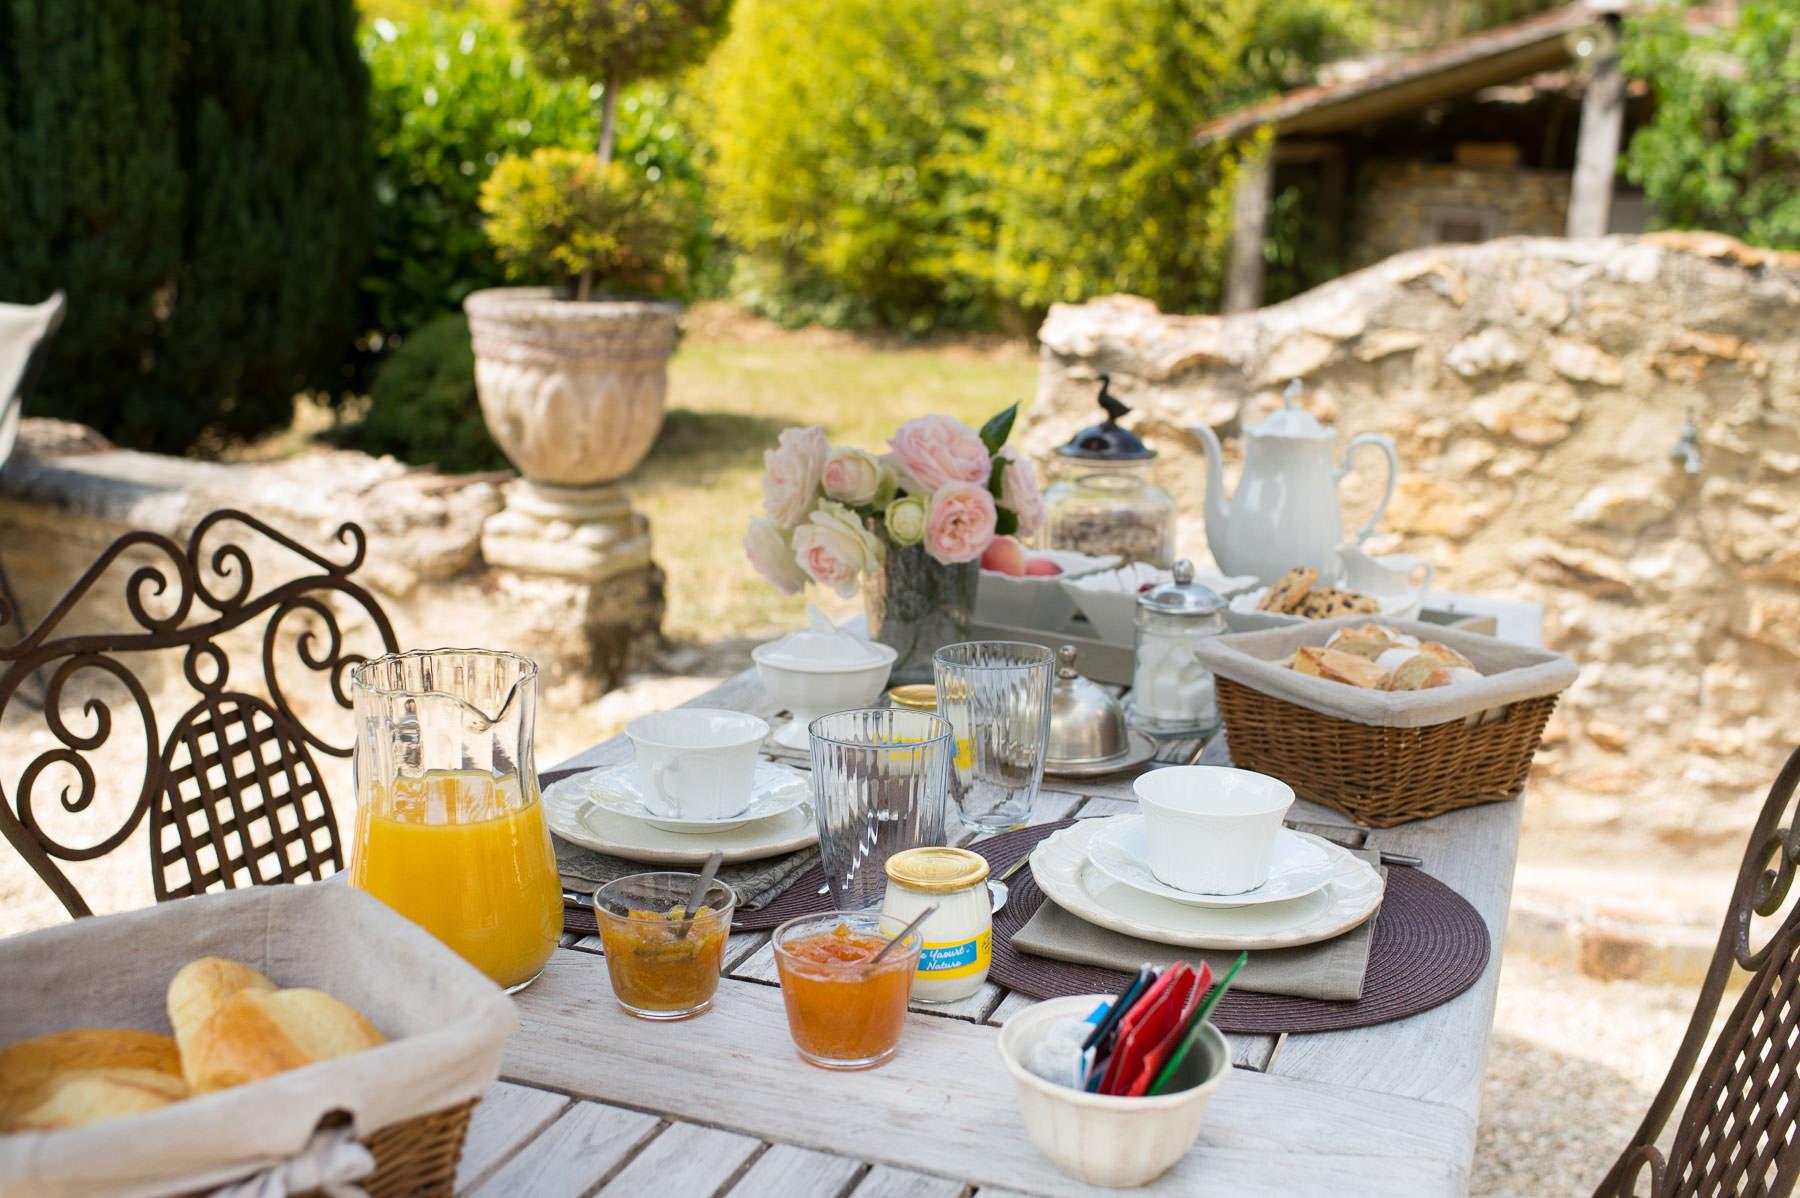 petit-dejeuner-chambres-dhotes-campagne